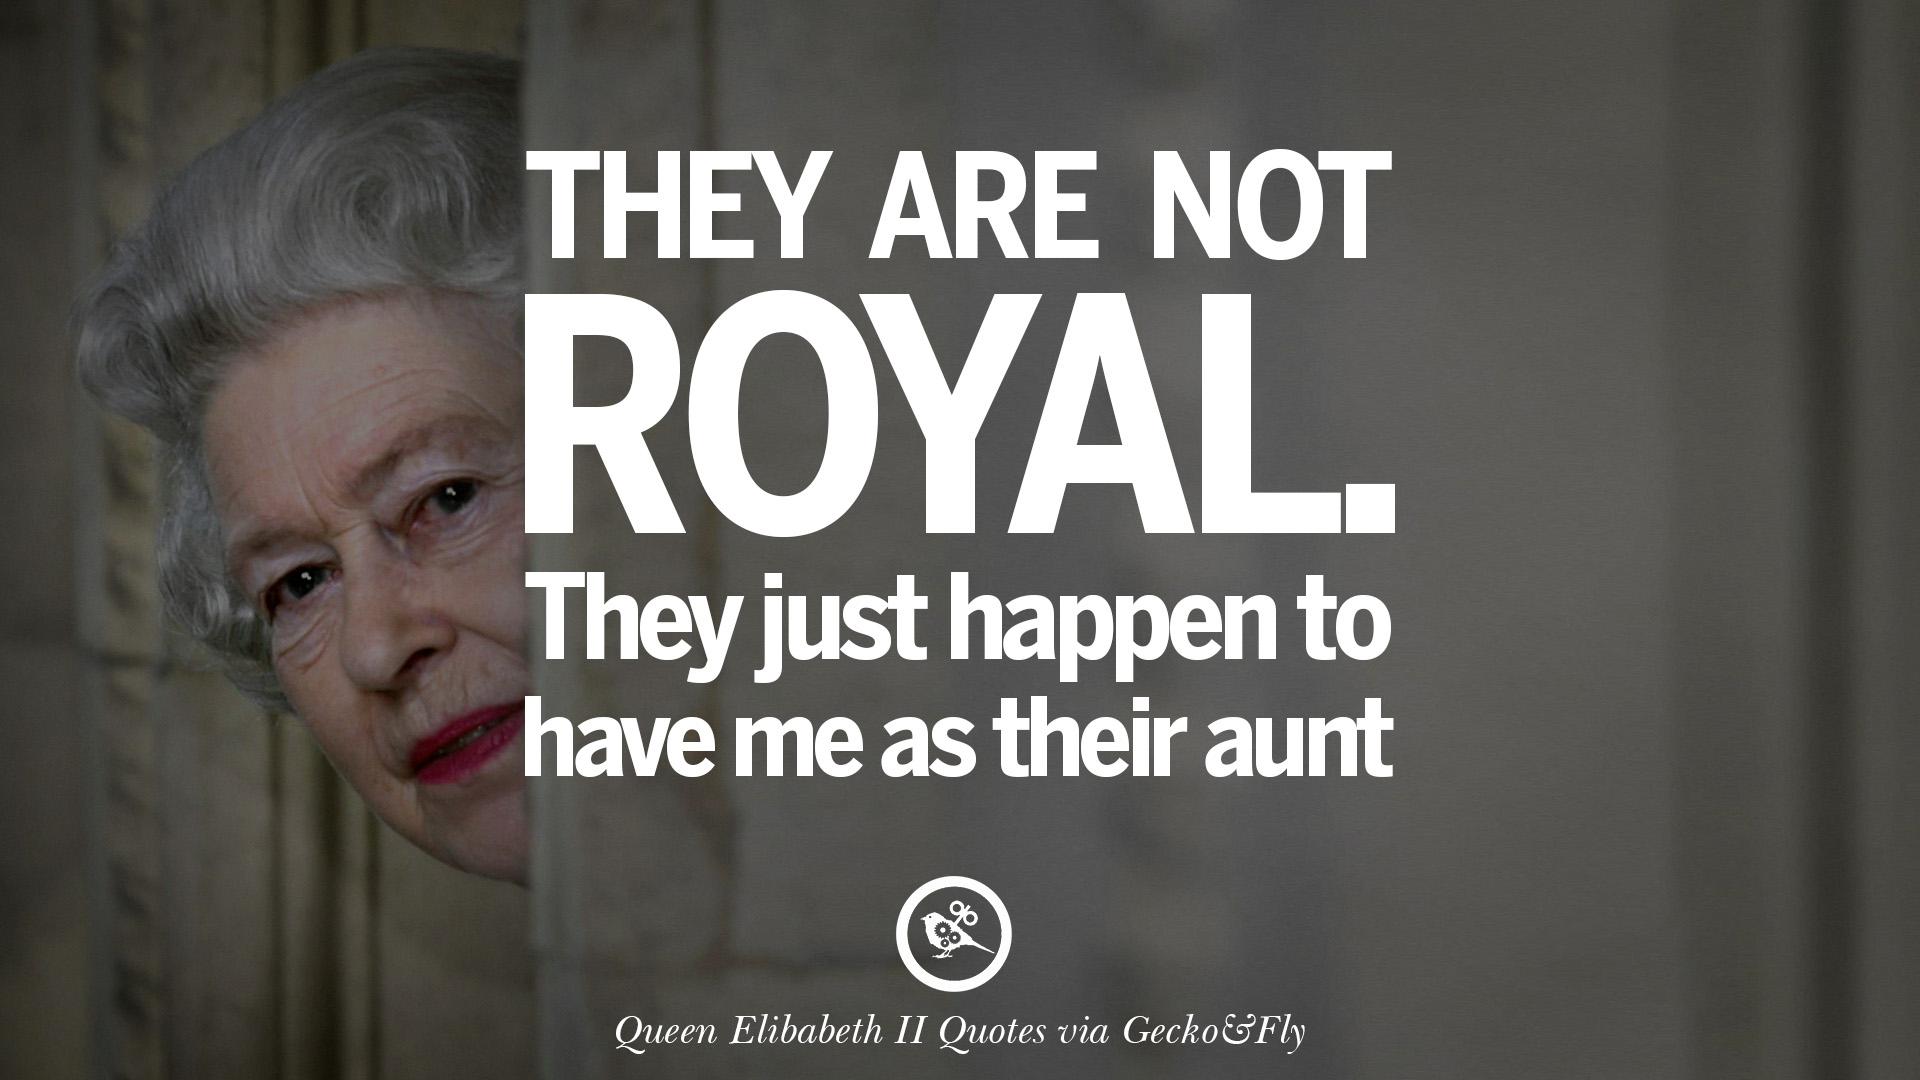 21 Inspiring Queen Elizabeth Ii Of The United Kingdom Quotes